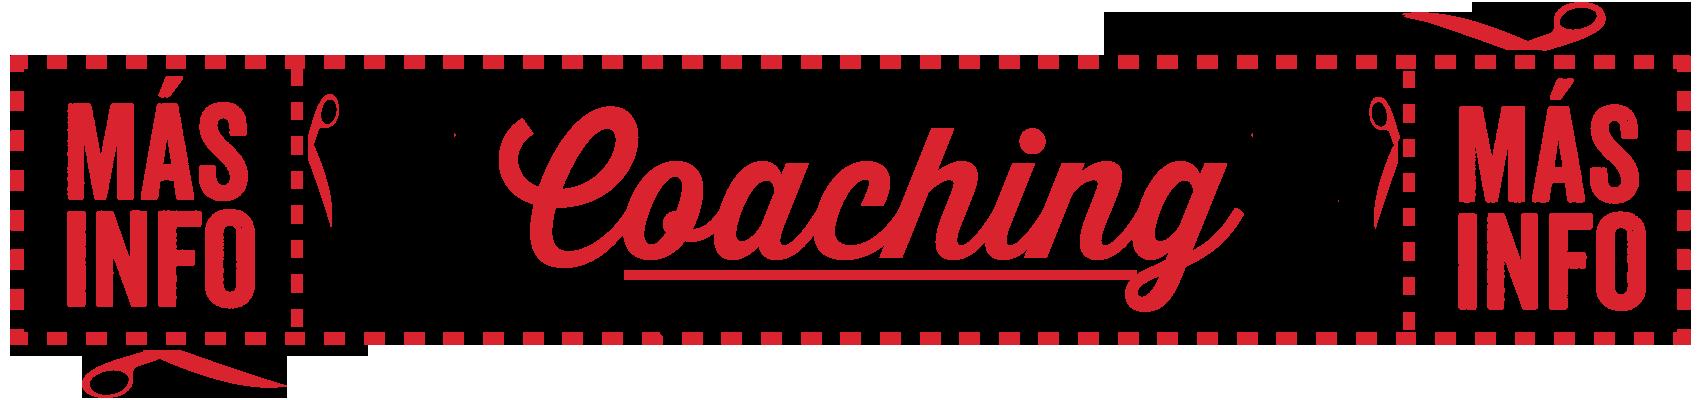 banner_coaching